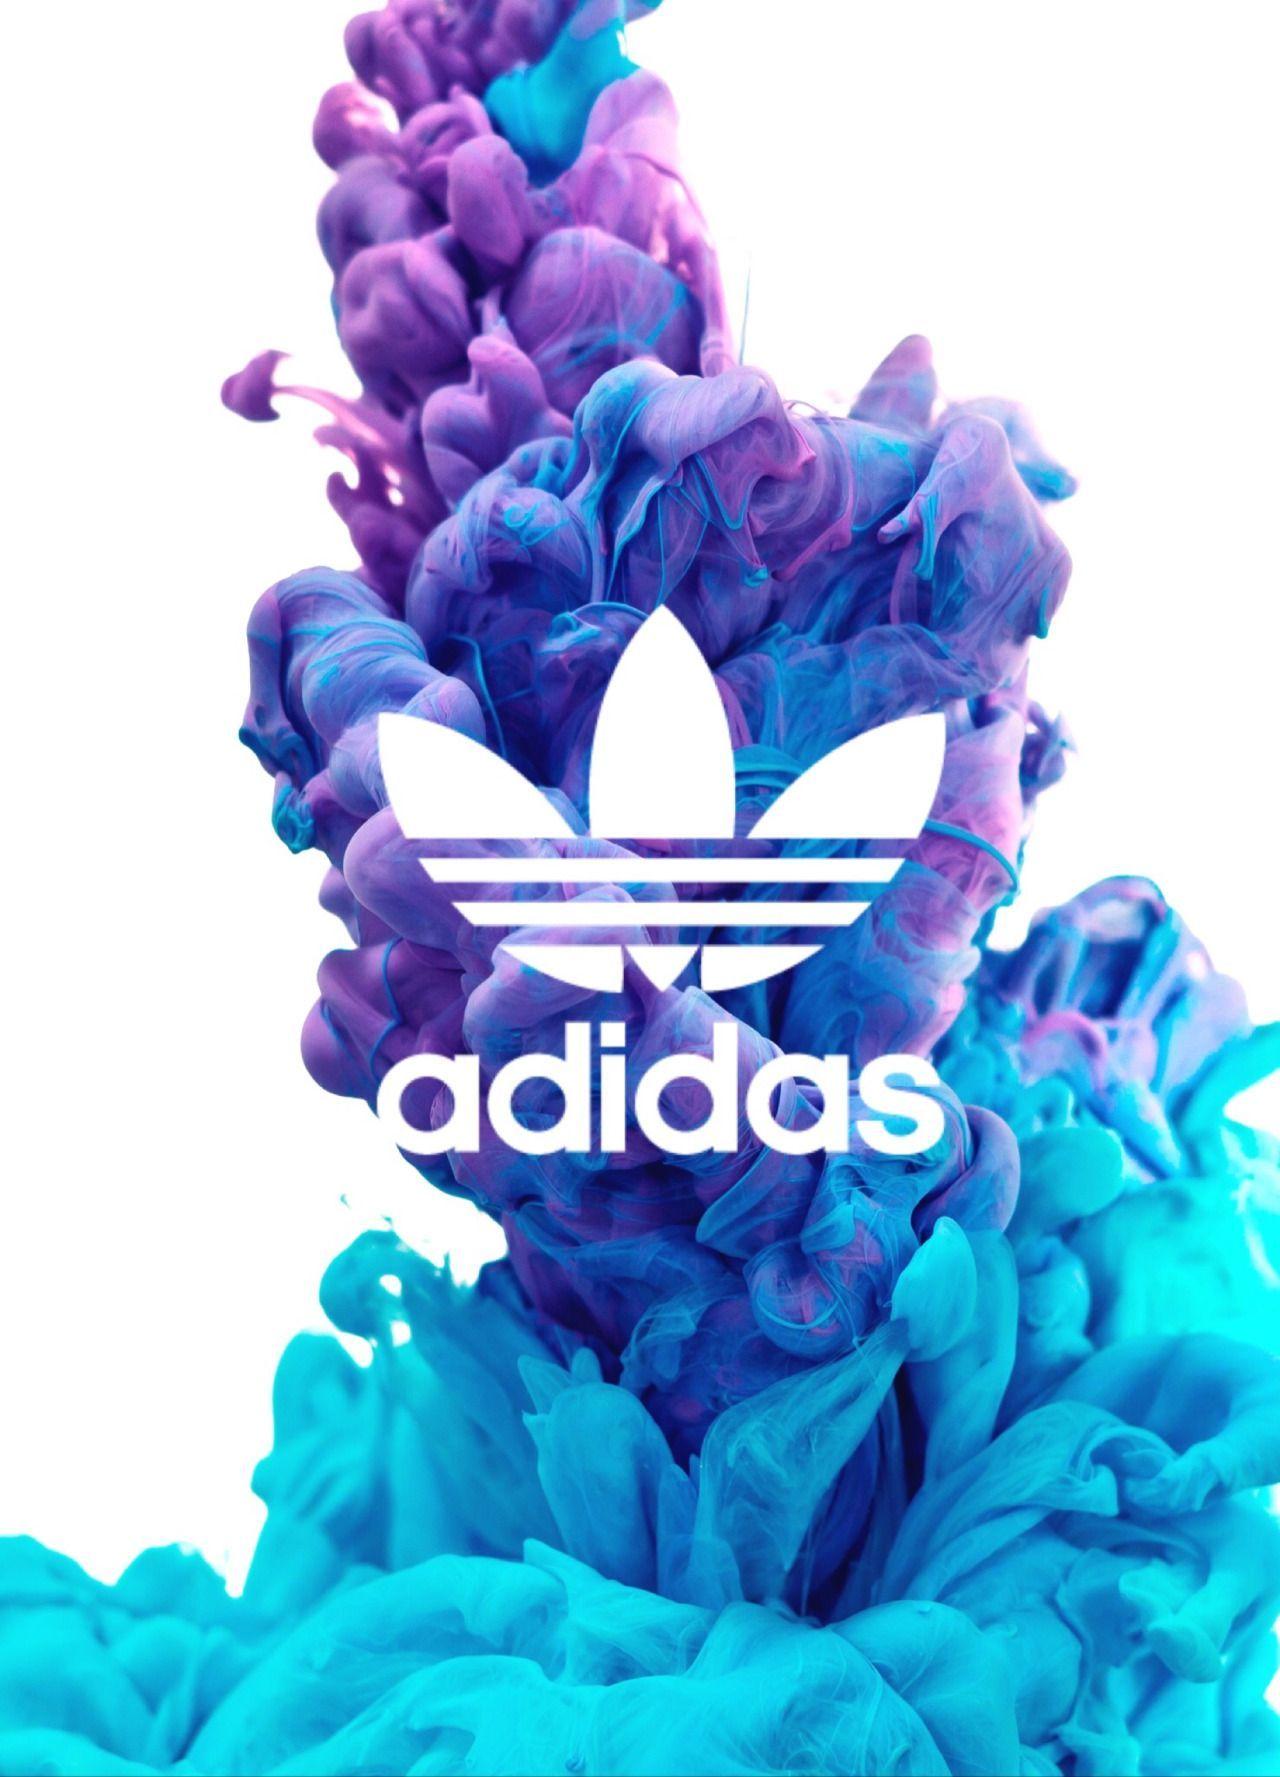 Adidas sfondo: foto tumblr transparents pinterest adidas